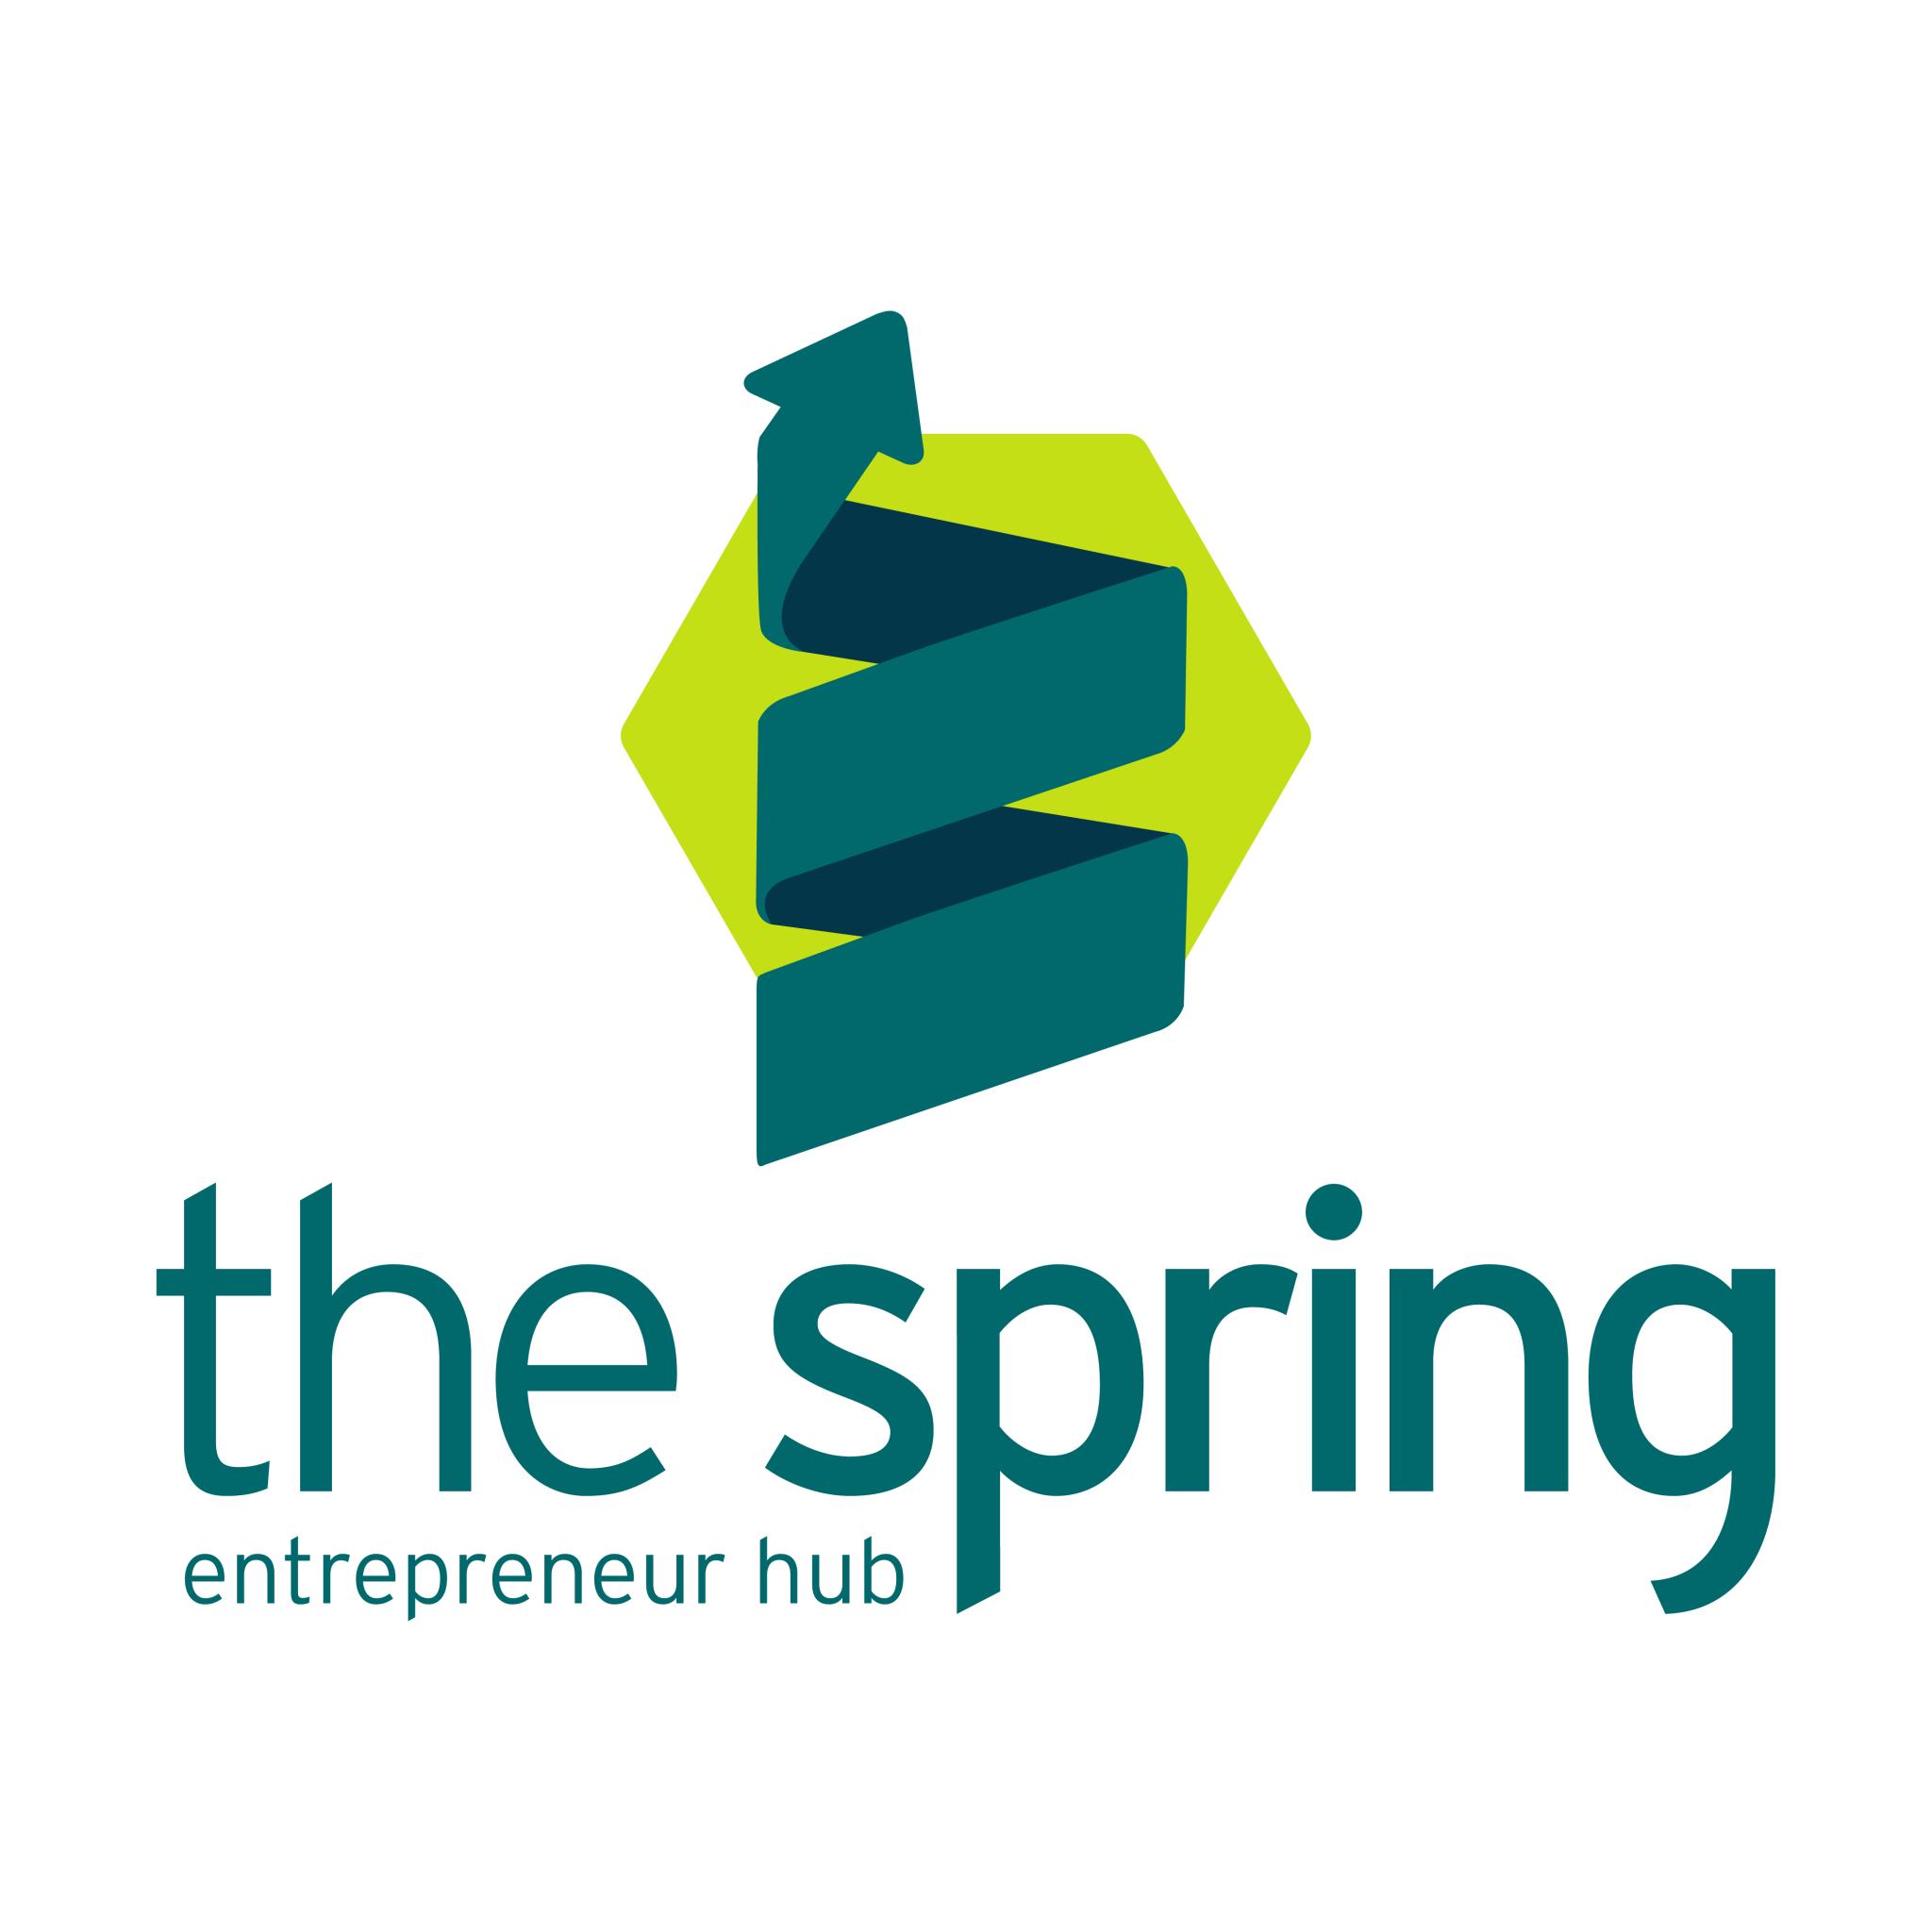 the spring entrepreneur hub